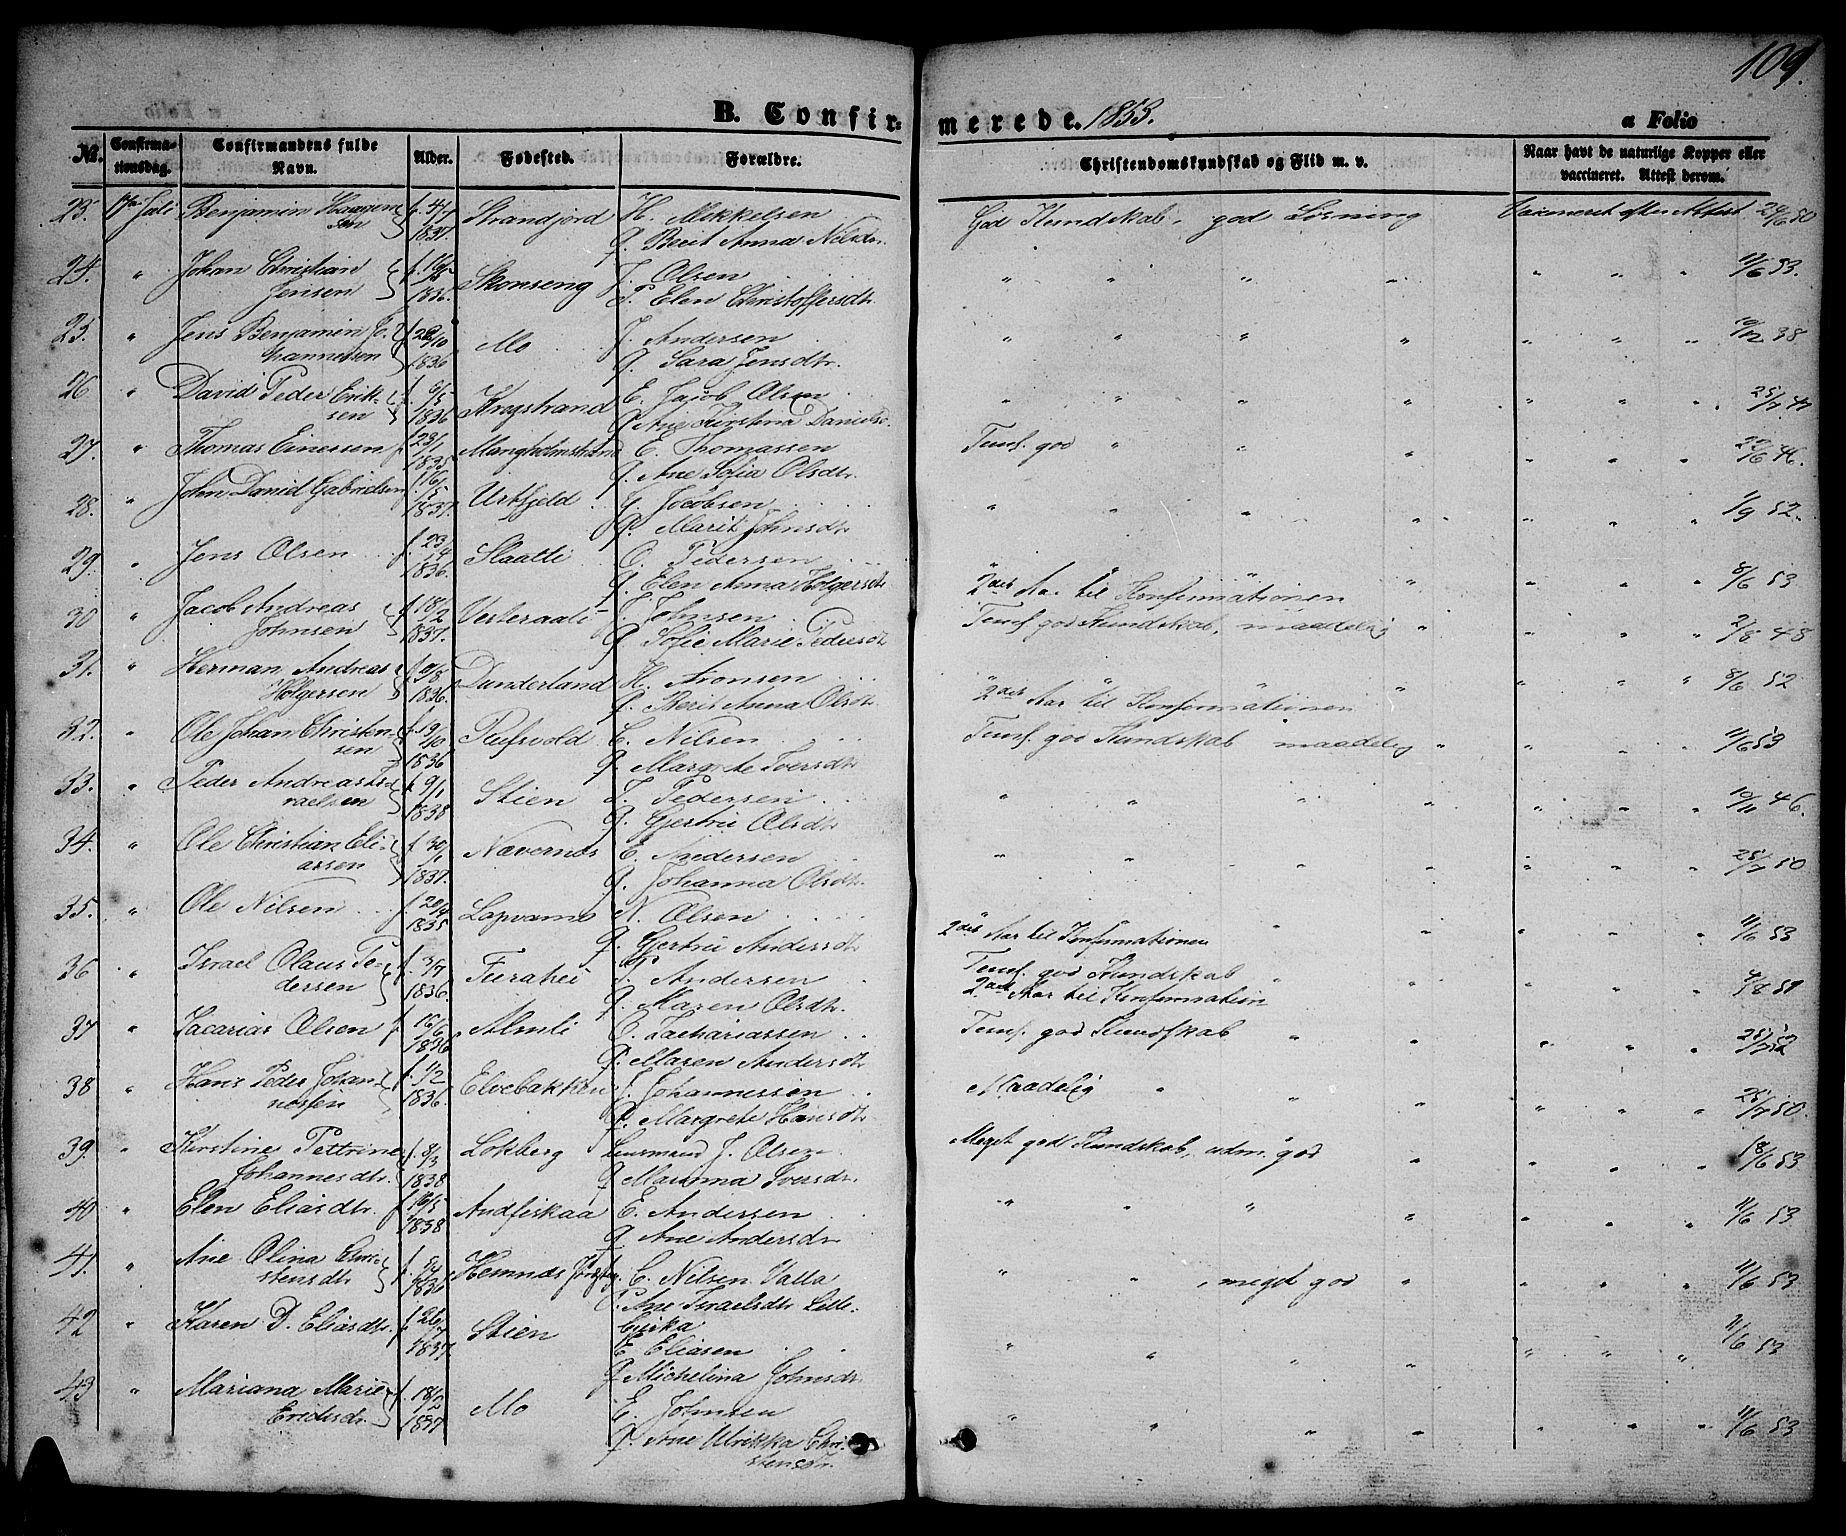 SAT, Ministerialprotokoller, klokkerbøker og fødselsregistre - Nordland, 827/L0414: Klokkerbok nr. 827C03, 1853-1865, s. 101